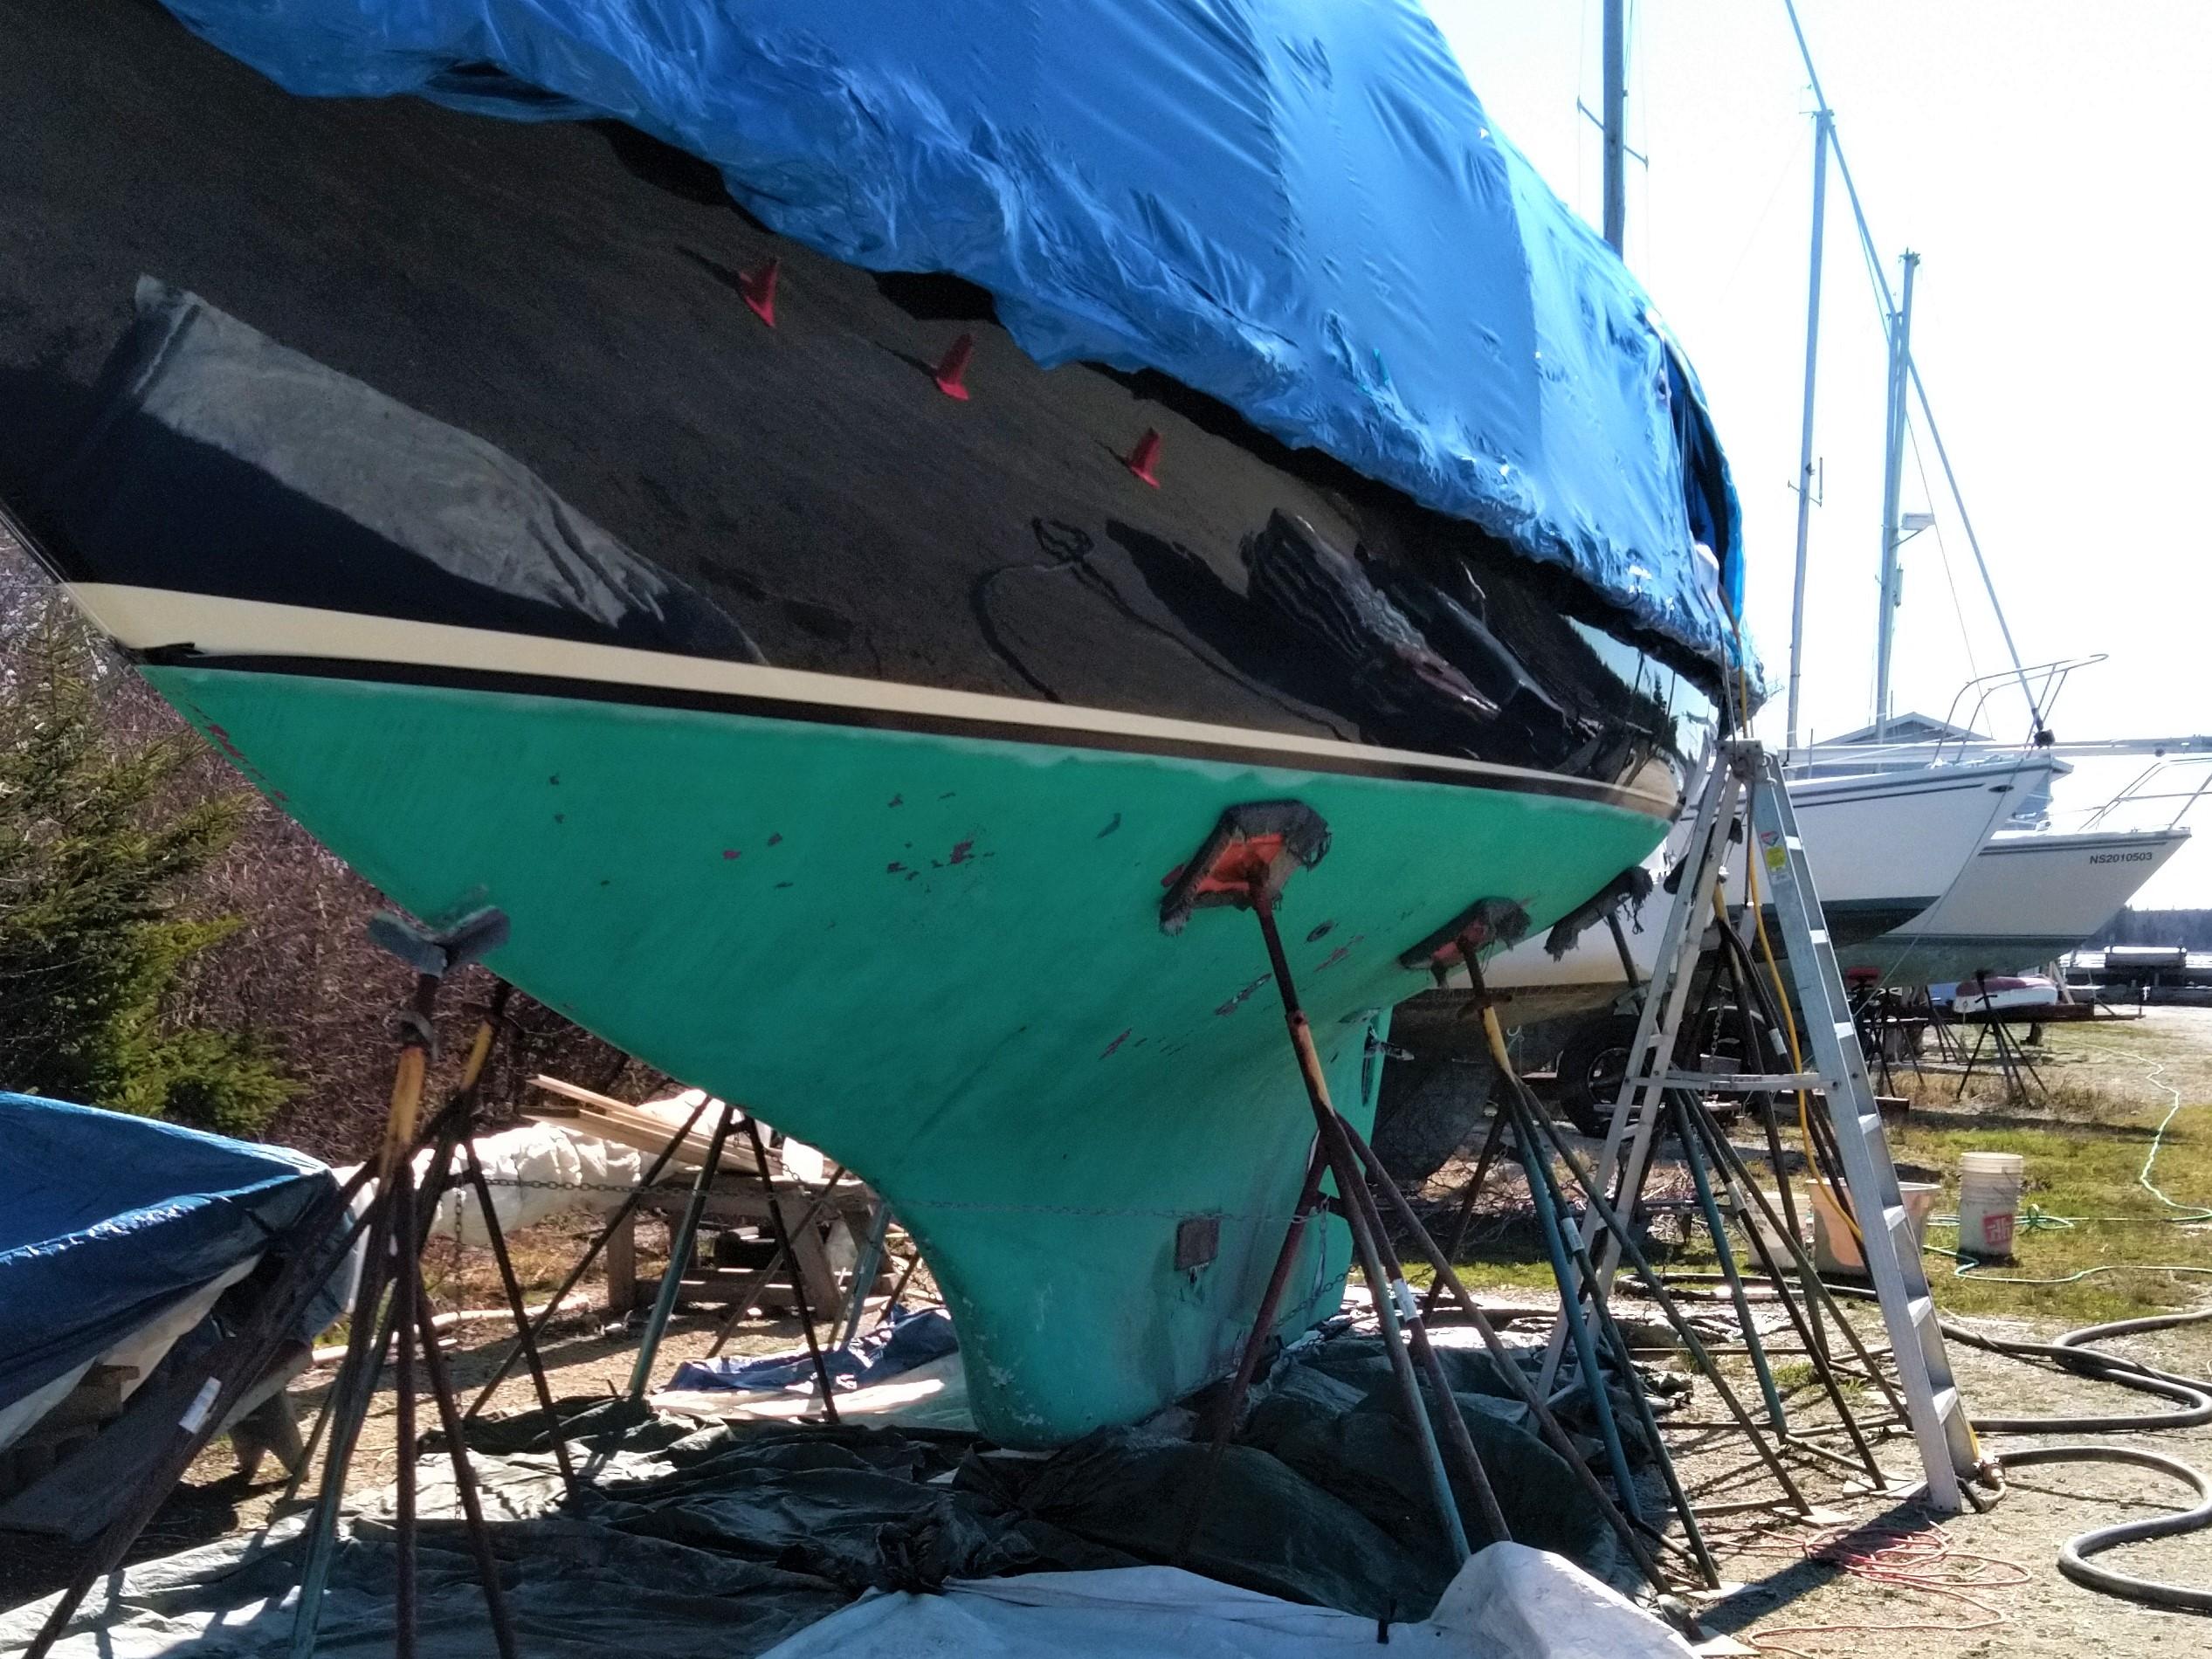 Maritime Blasting Sail boat 1 before